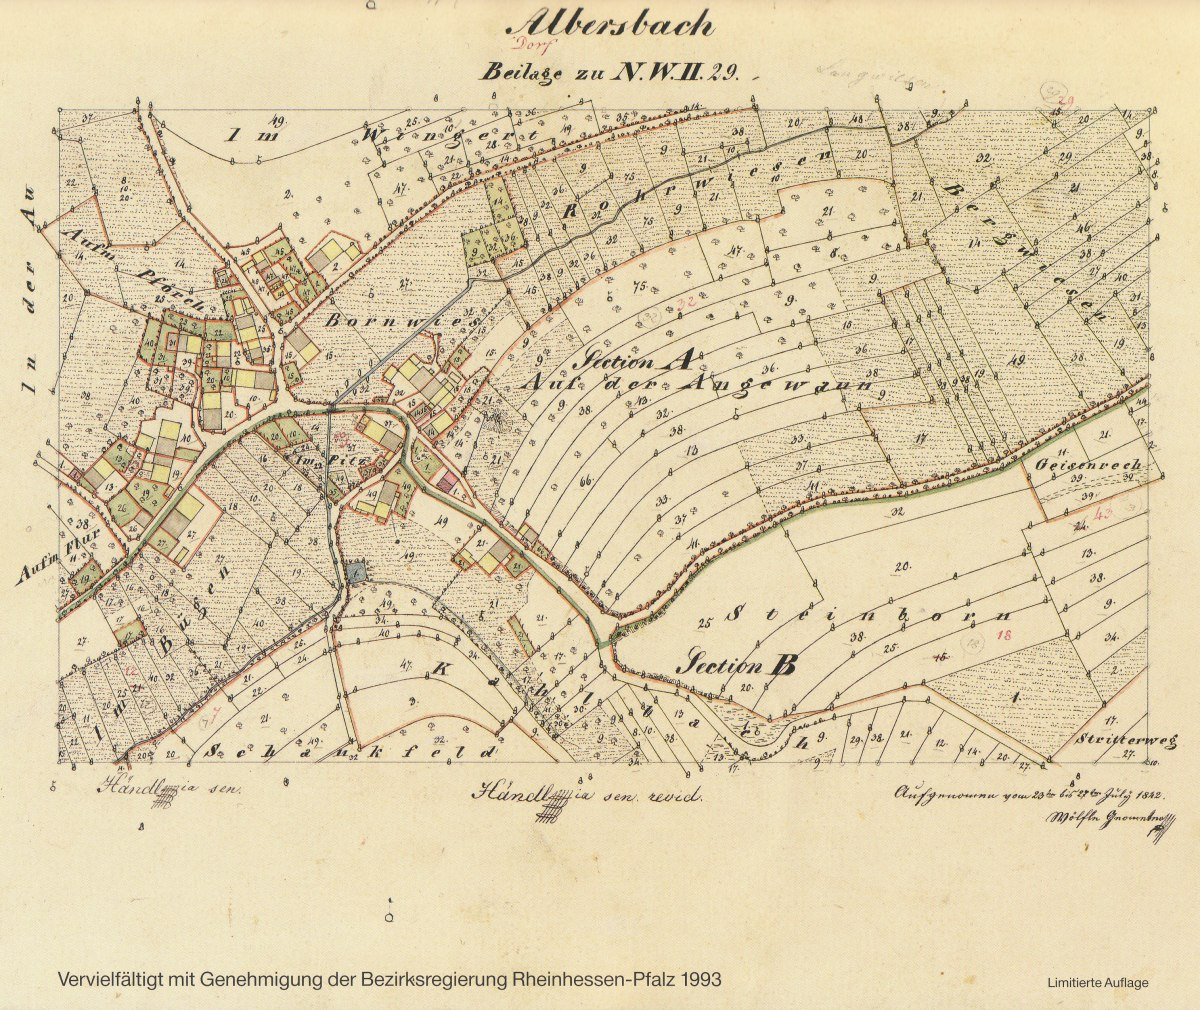 Ramstein AB Germany Set Five Albersbach - Germany map ramstein